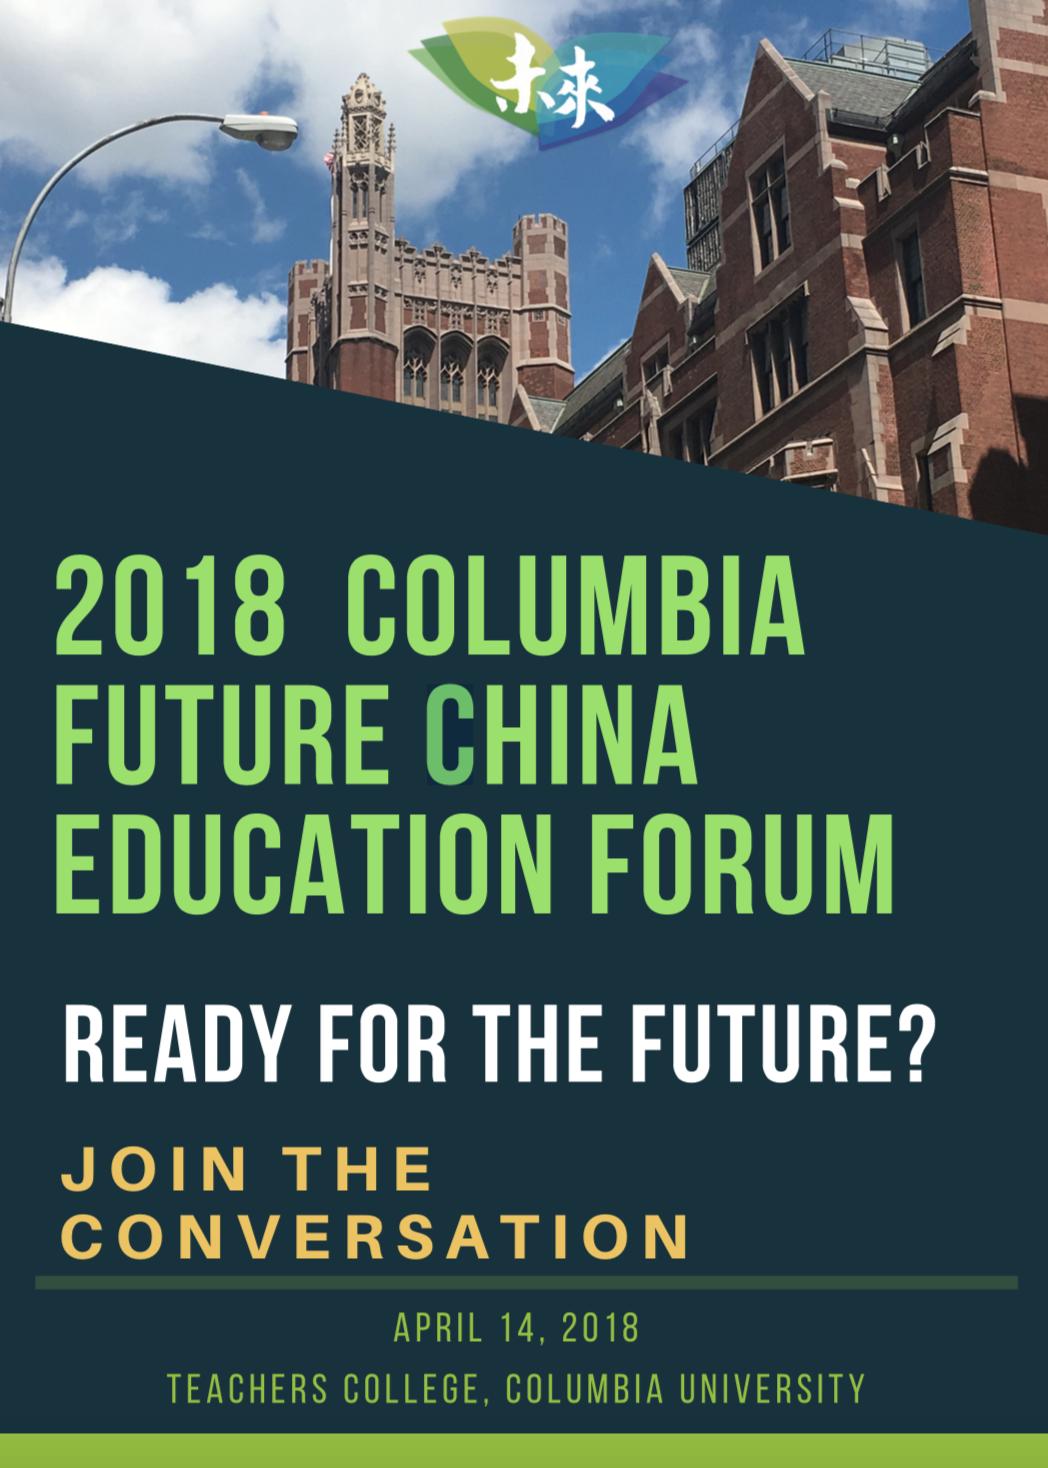 On Campus: 2018 Columbia Future China Education Forum